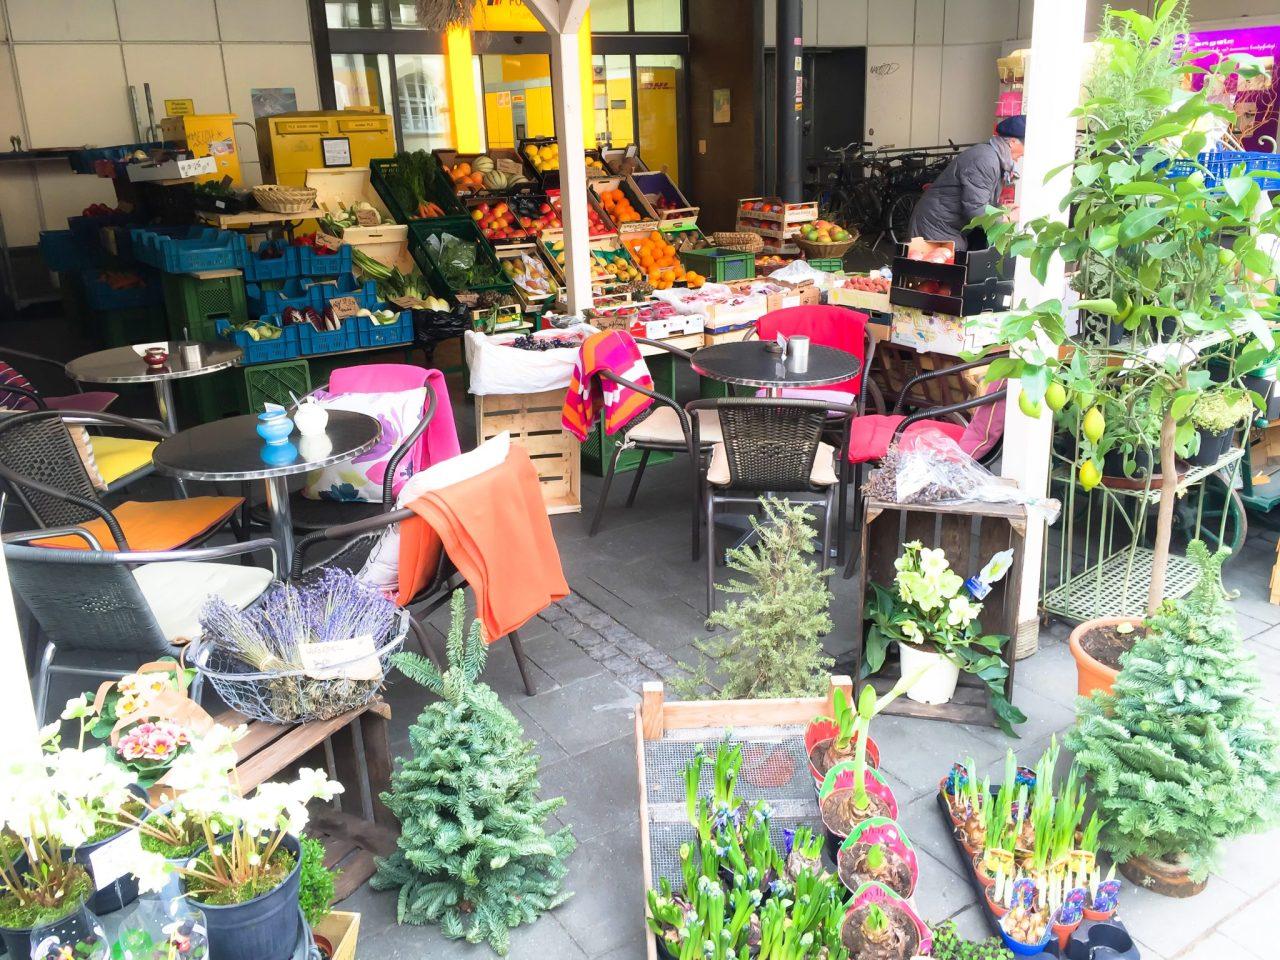 Gelungene Integration: Blumen, Obst, Cafe